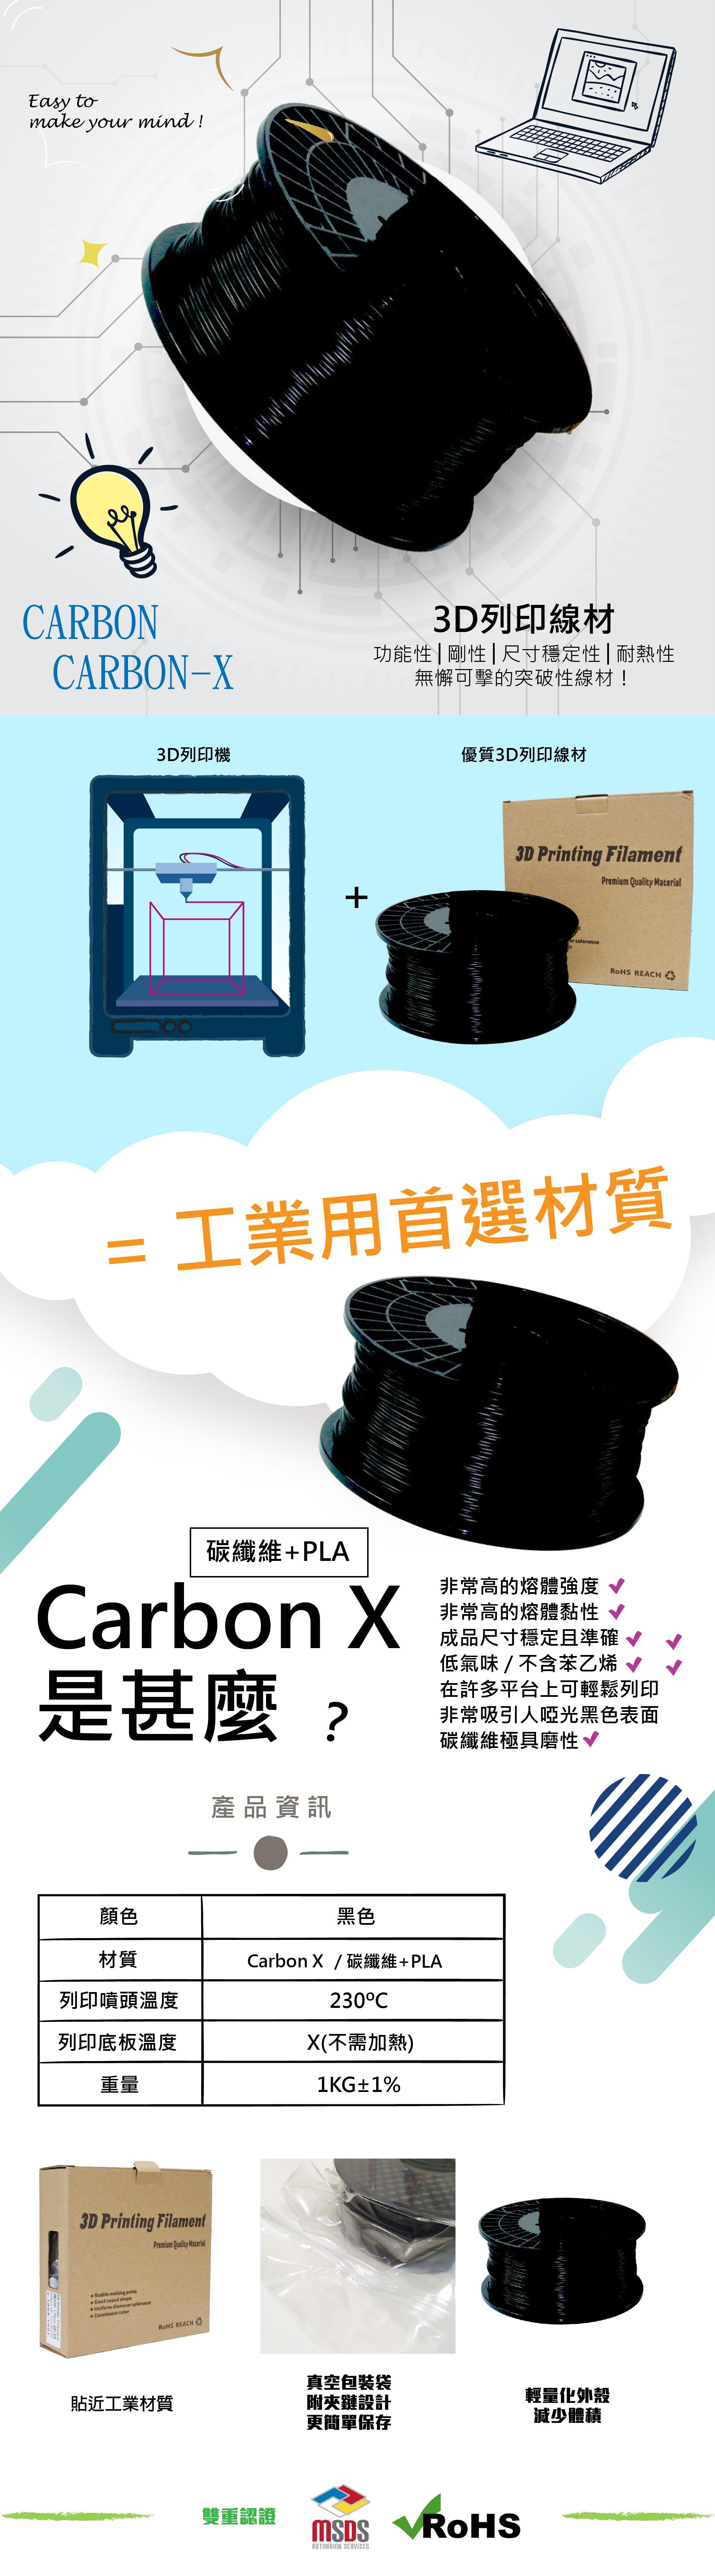 CARBON X官網-01-min.jpg